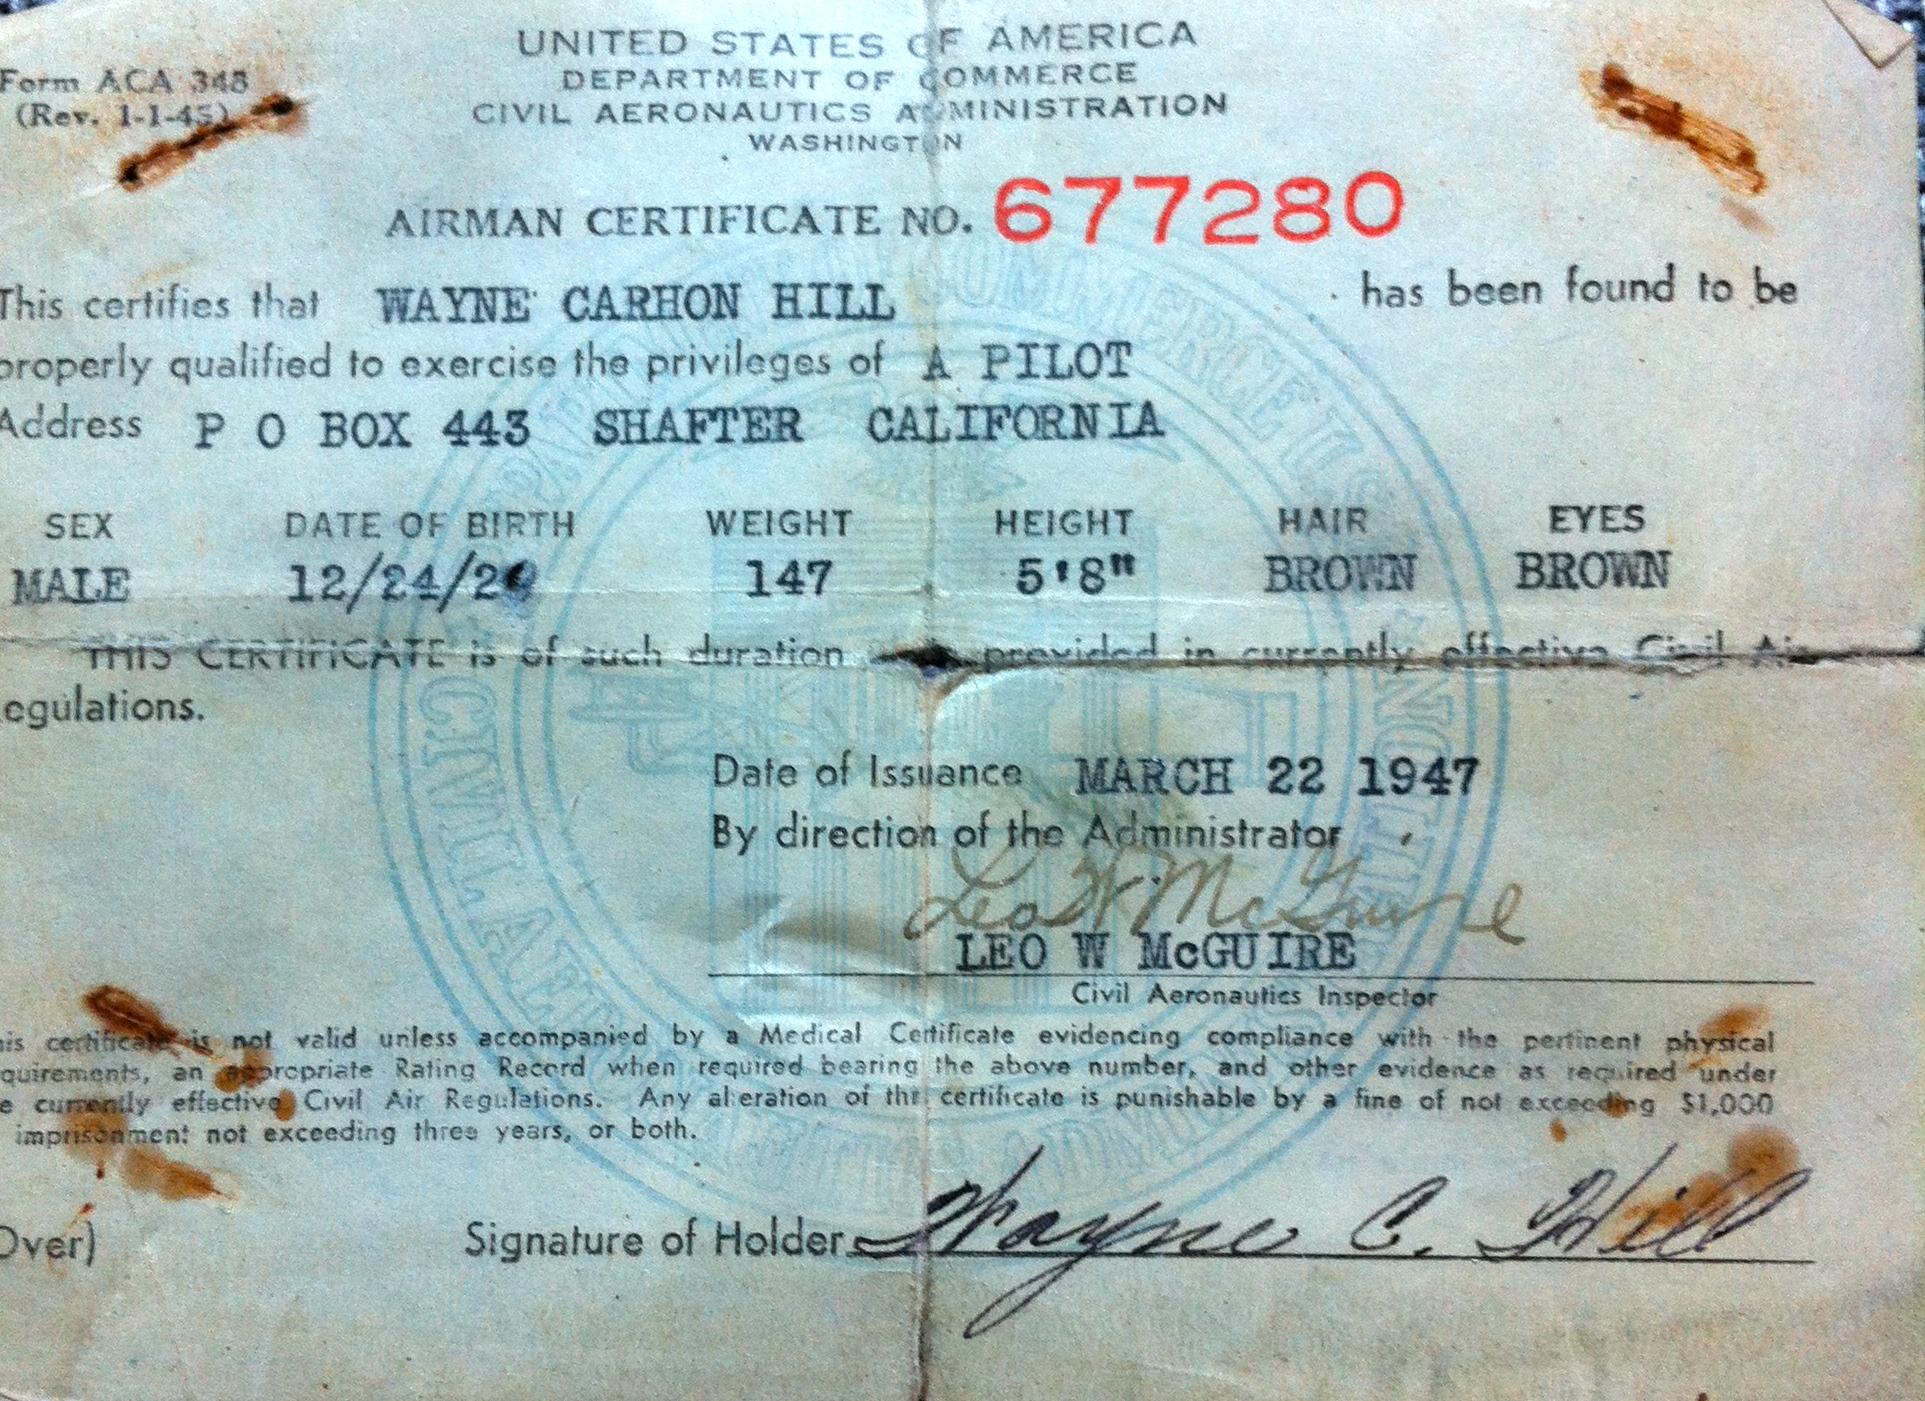 Wayne Carlton Hill Pilot's License